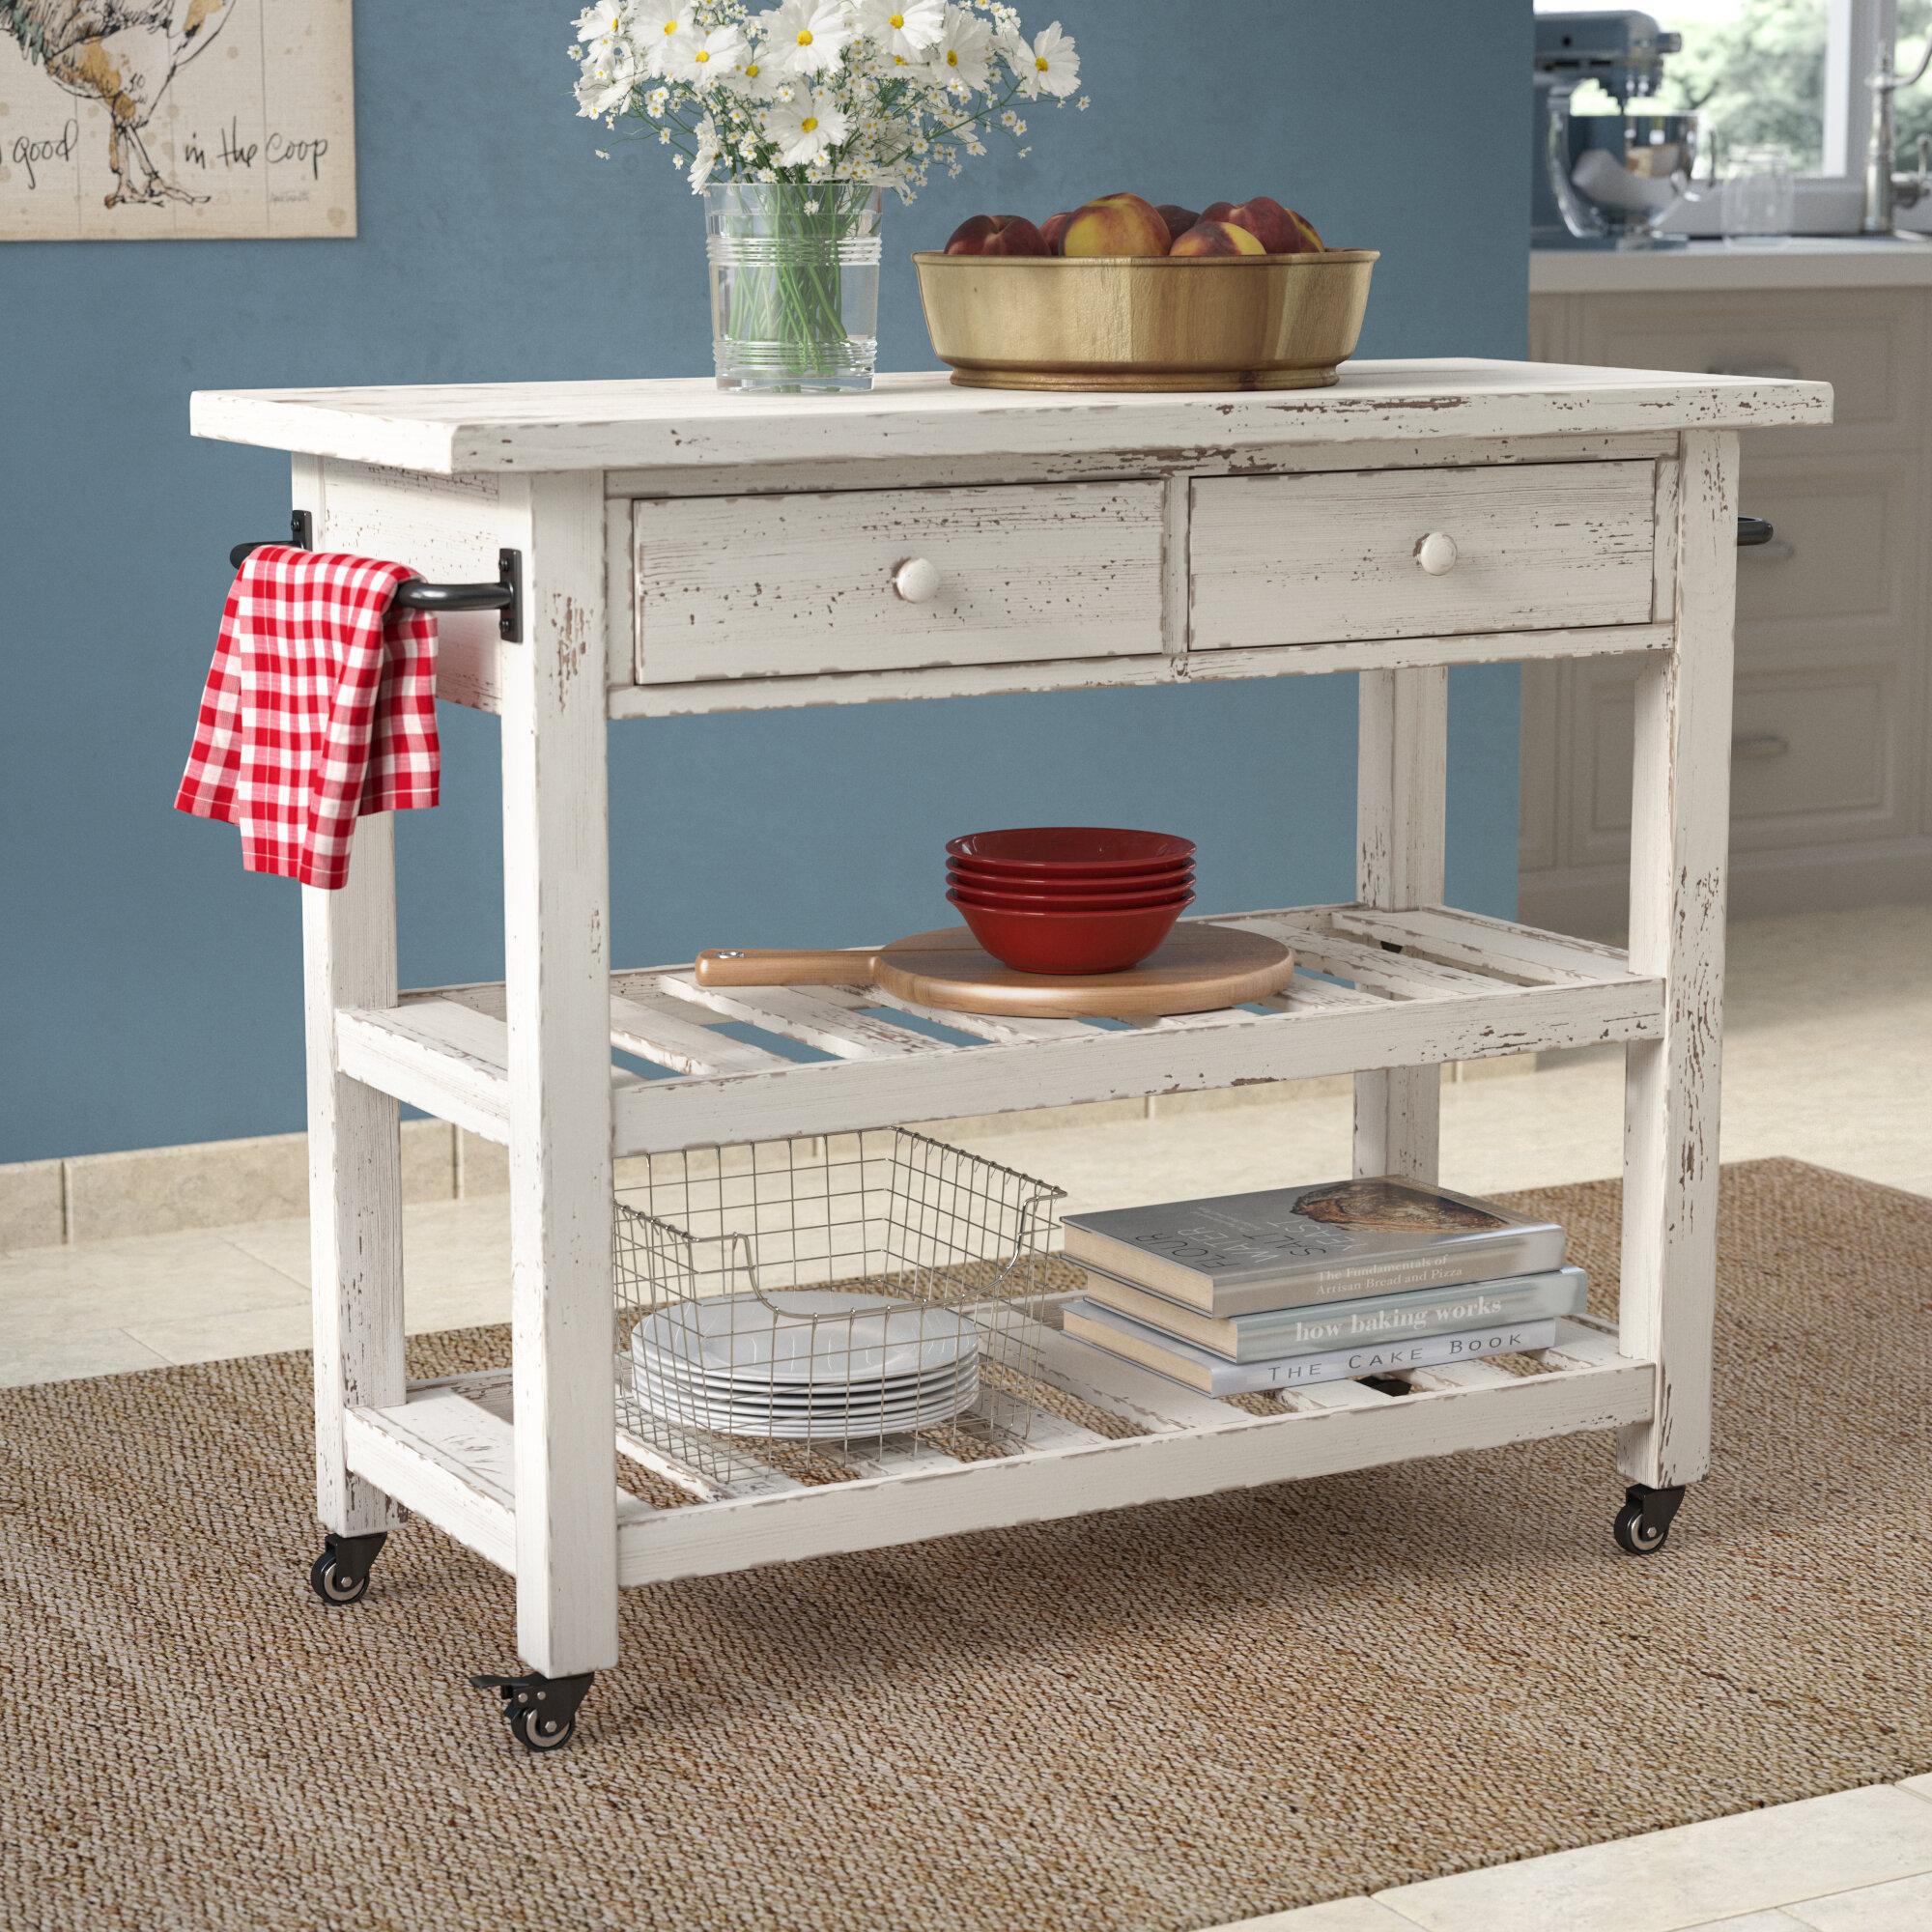 Bedford White Kitchen Cart With Butcher Block Top : Kitchen Baking Cart @TD22 ? Roccommunity